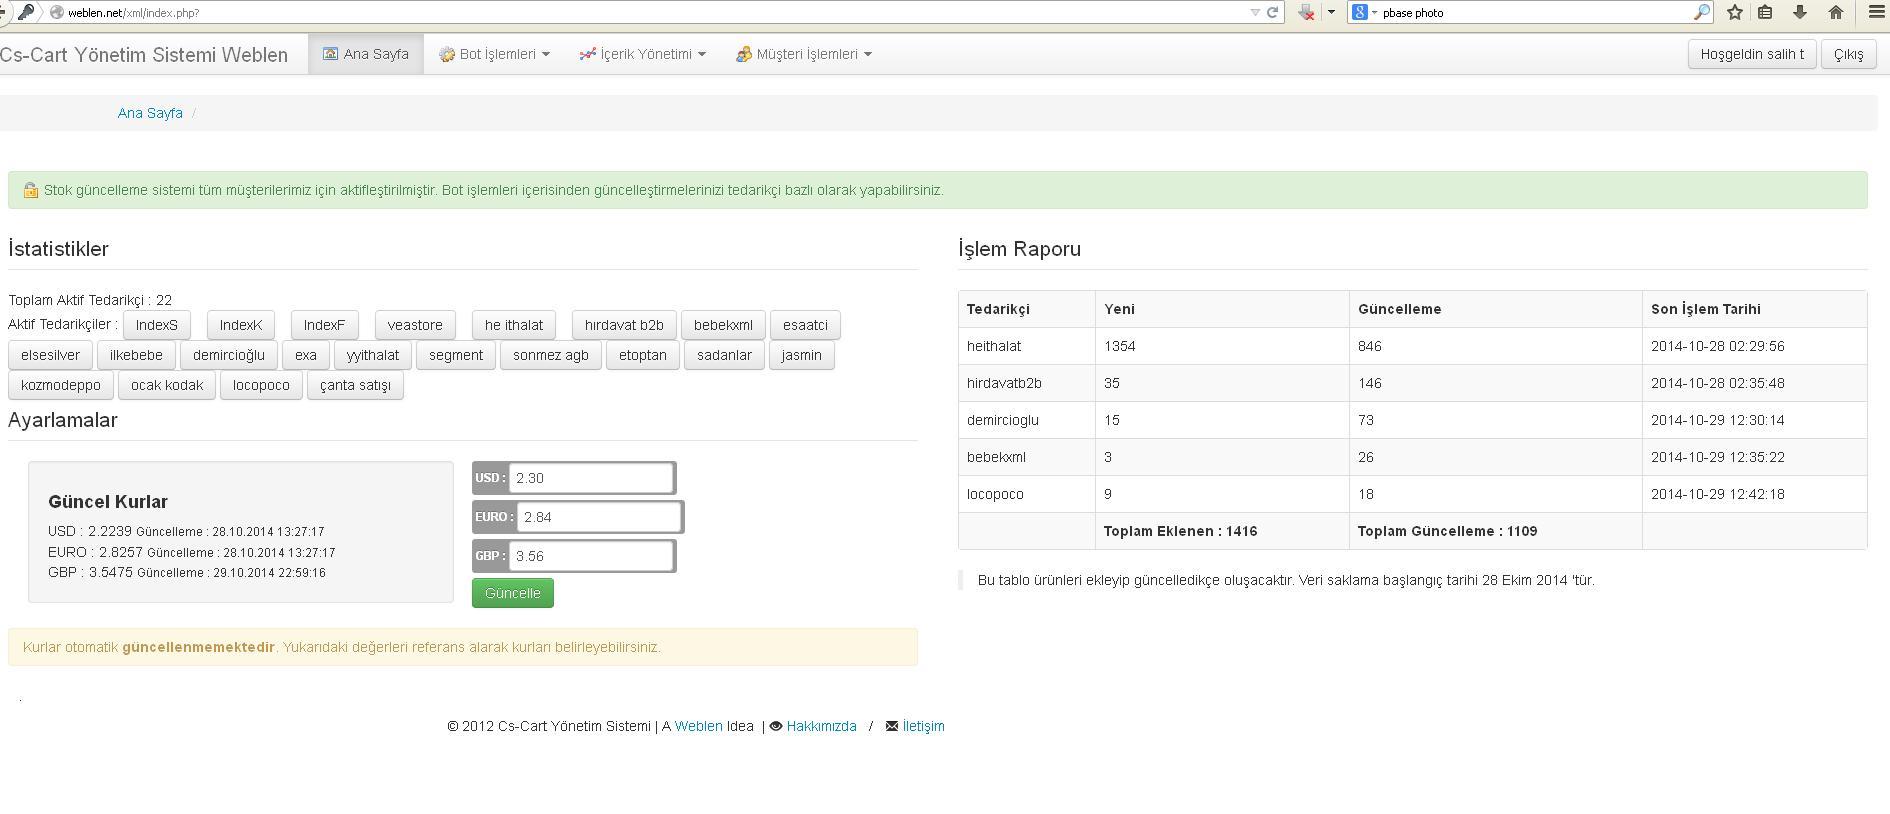 tedarikci-xml-cs-cart-weblen-index.jpg